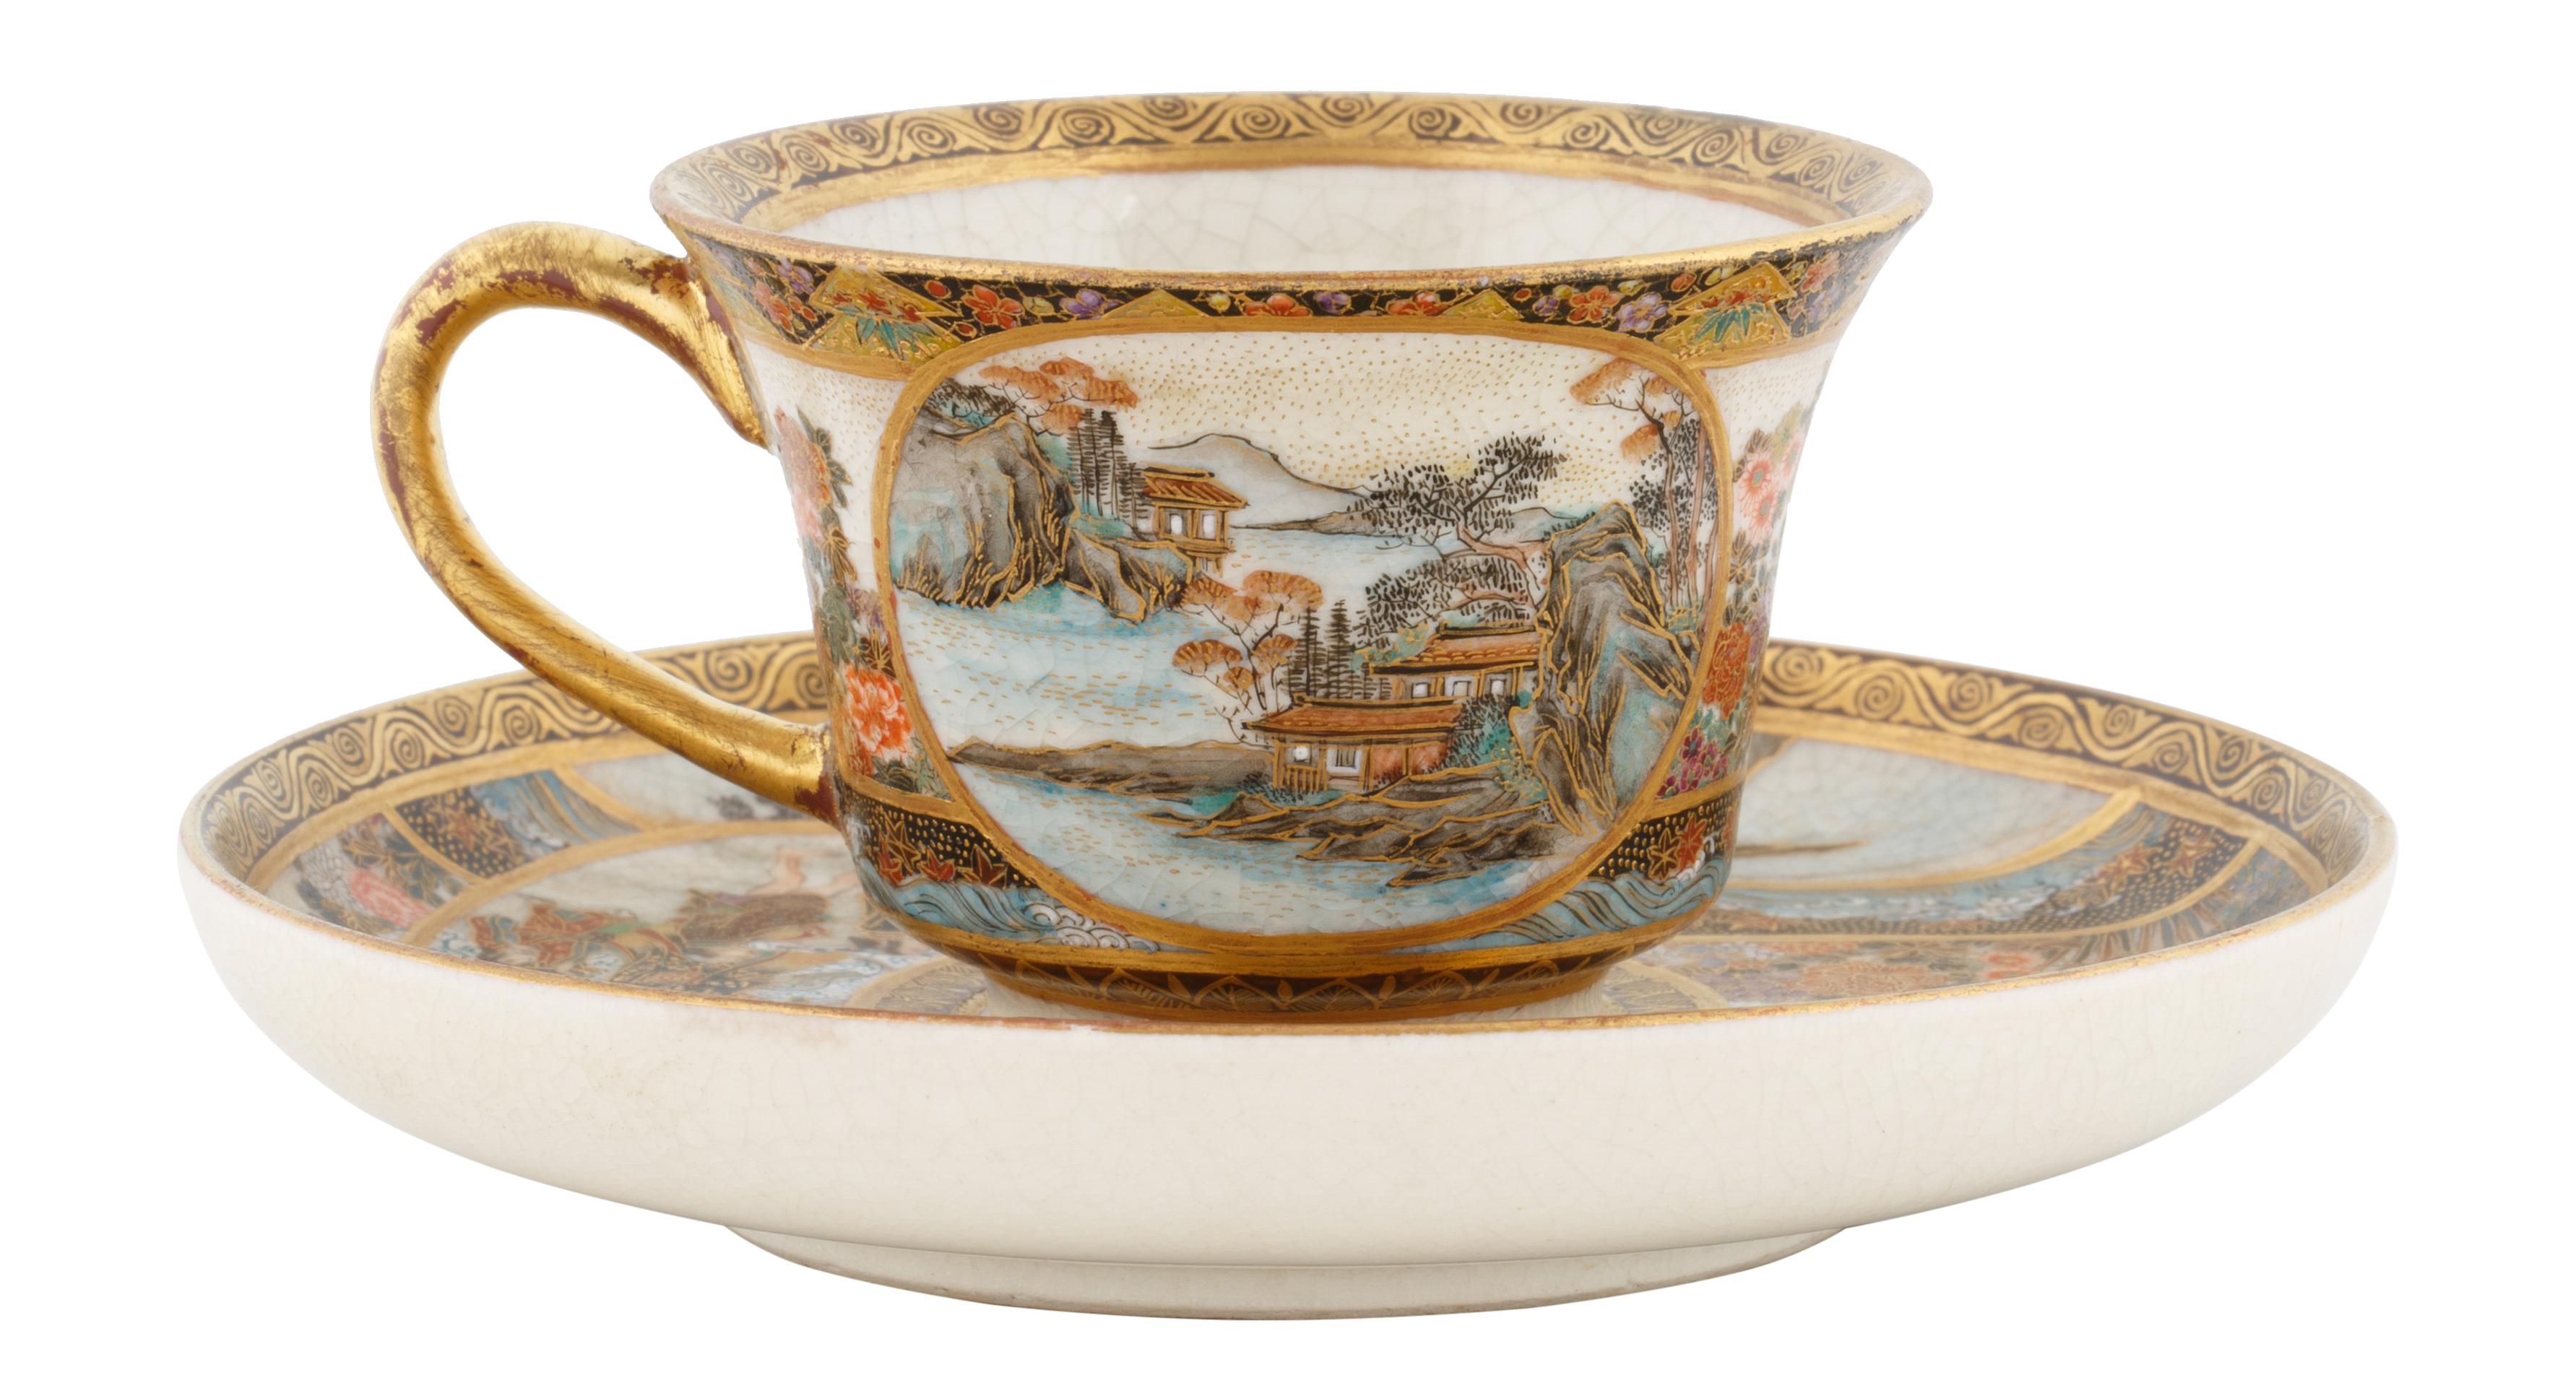 19TH CENTURY SATSUMA PORCELAIN TEA CUP AND SAUCER - Image 2 of 7